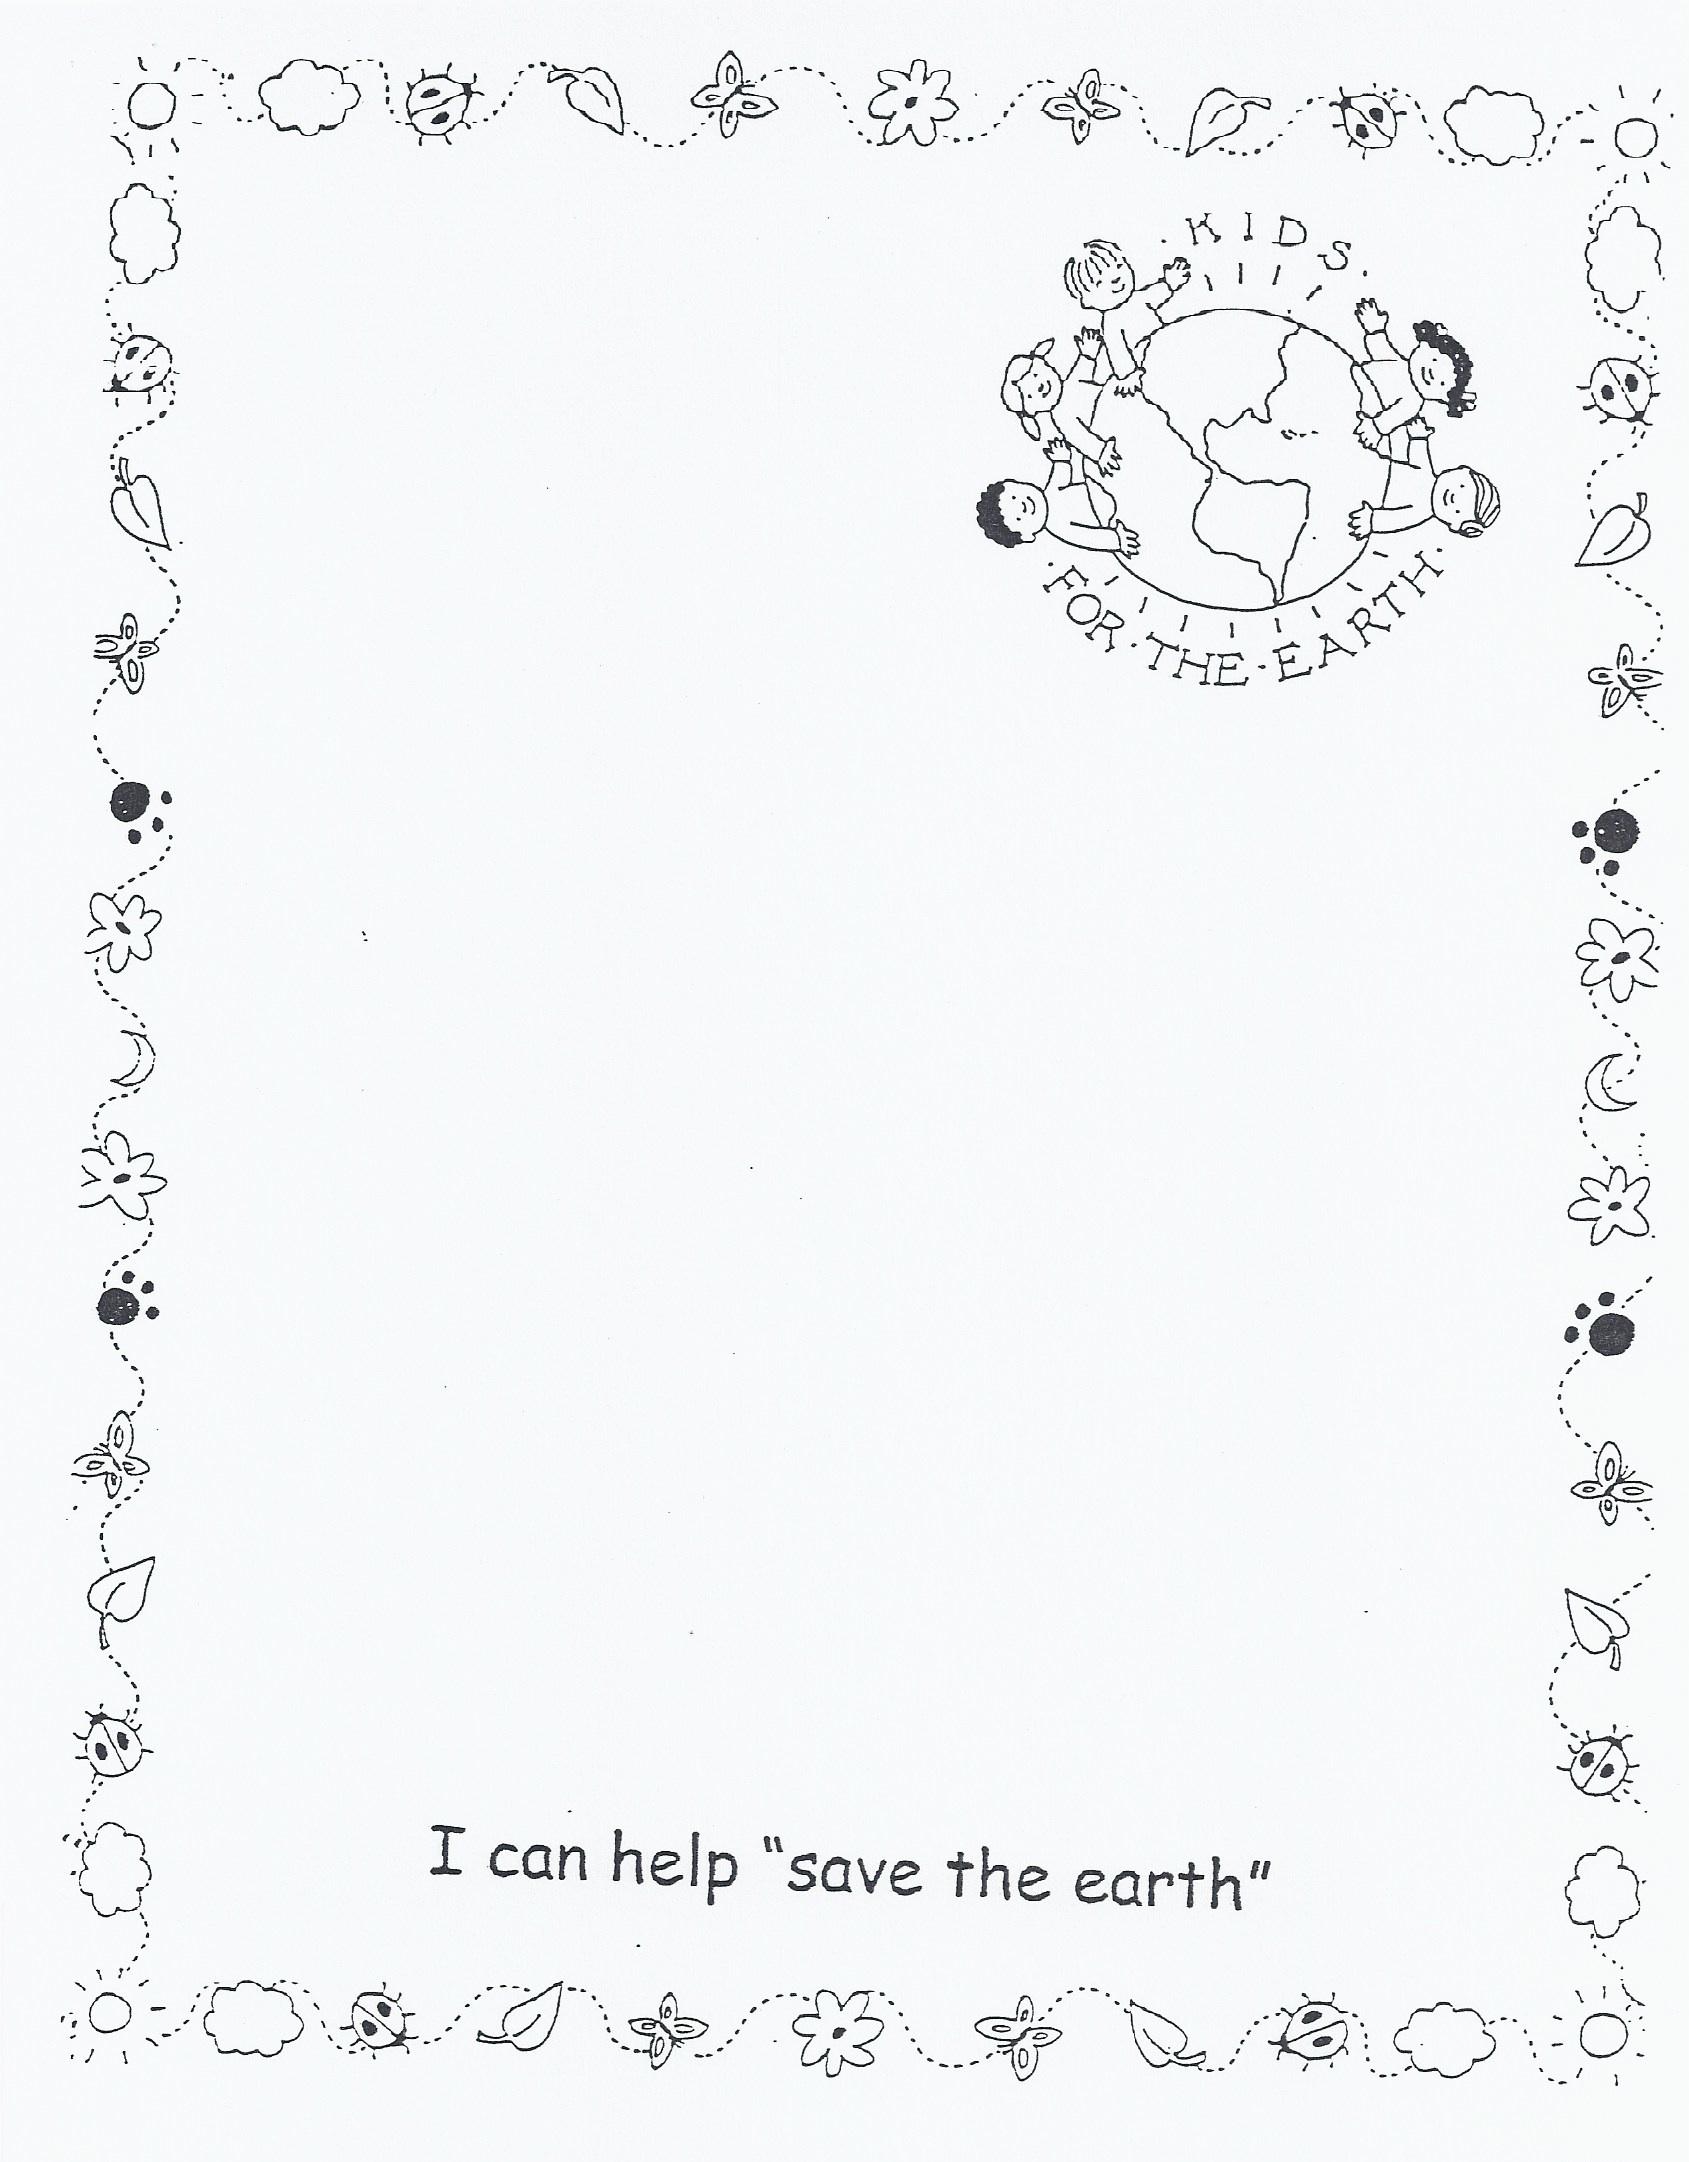 Recycling Worksheet For Kindergarten